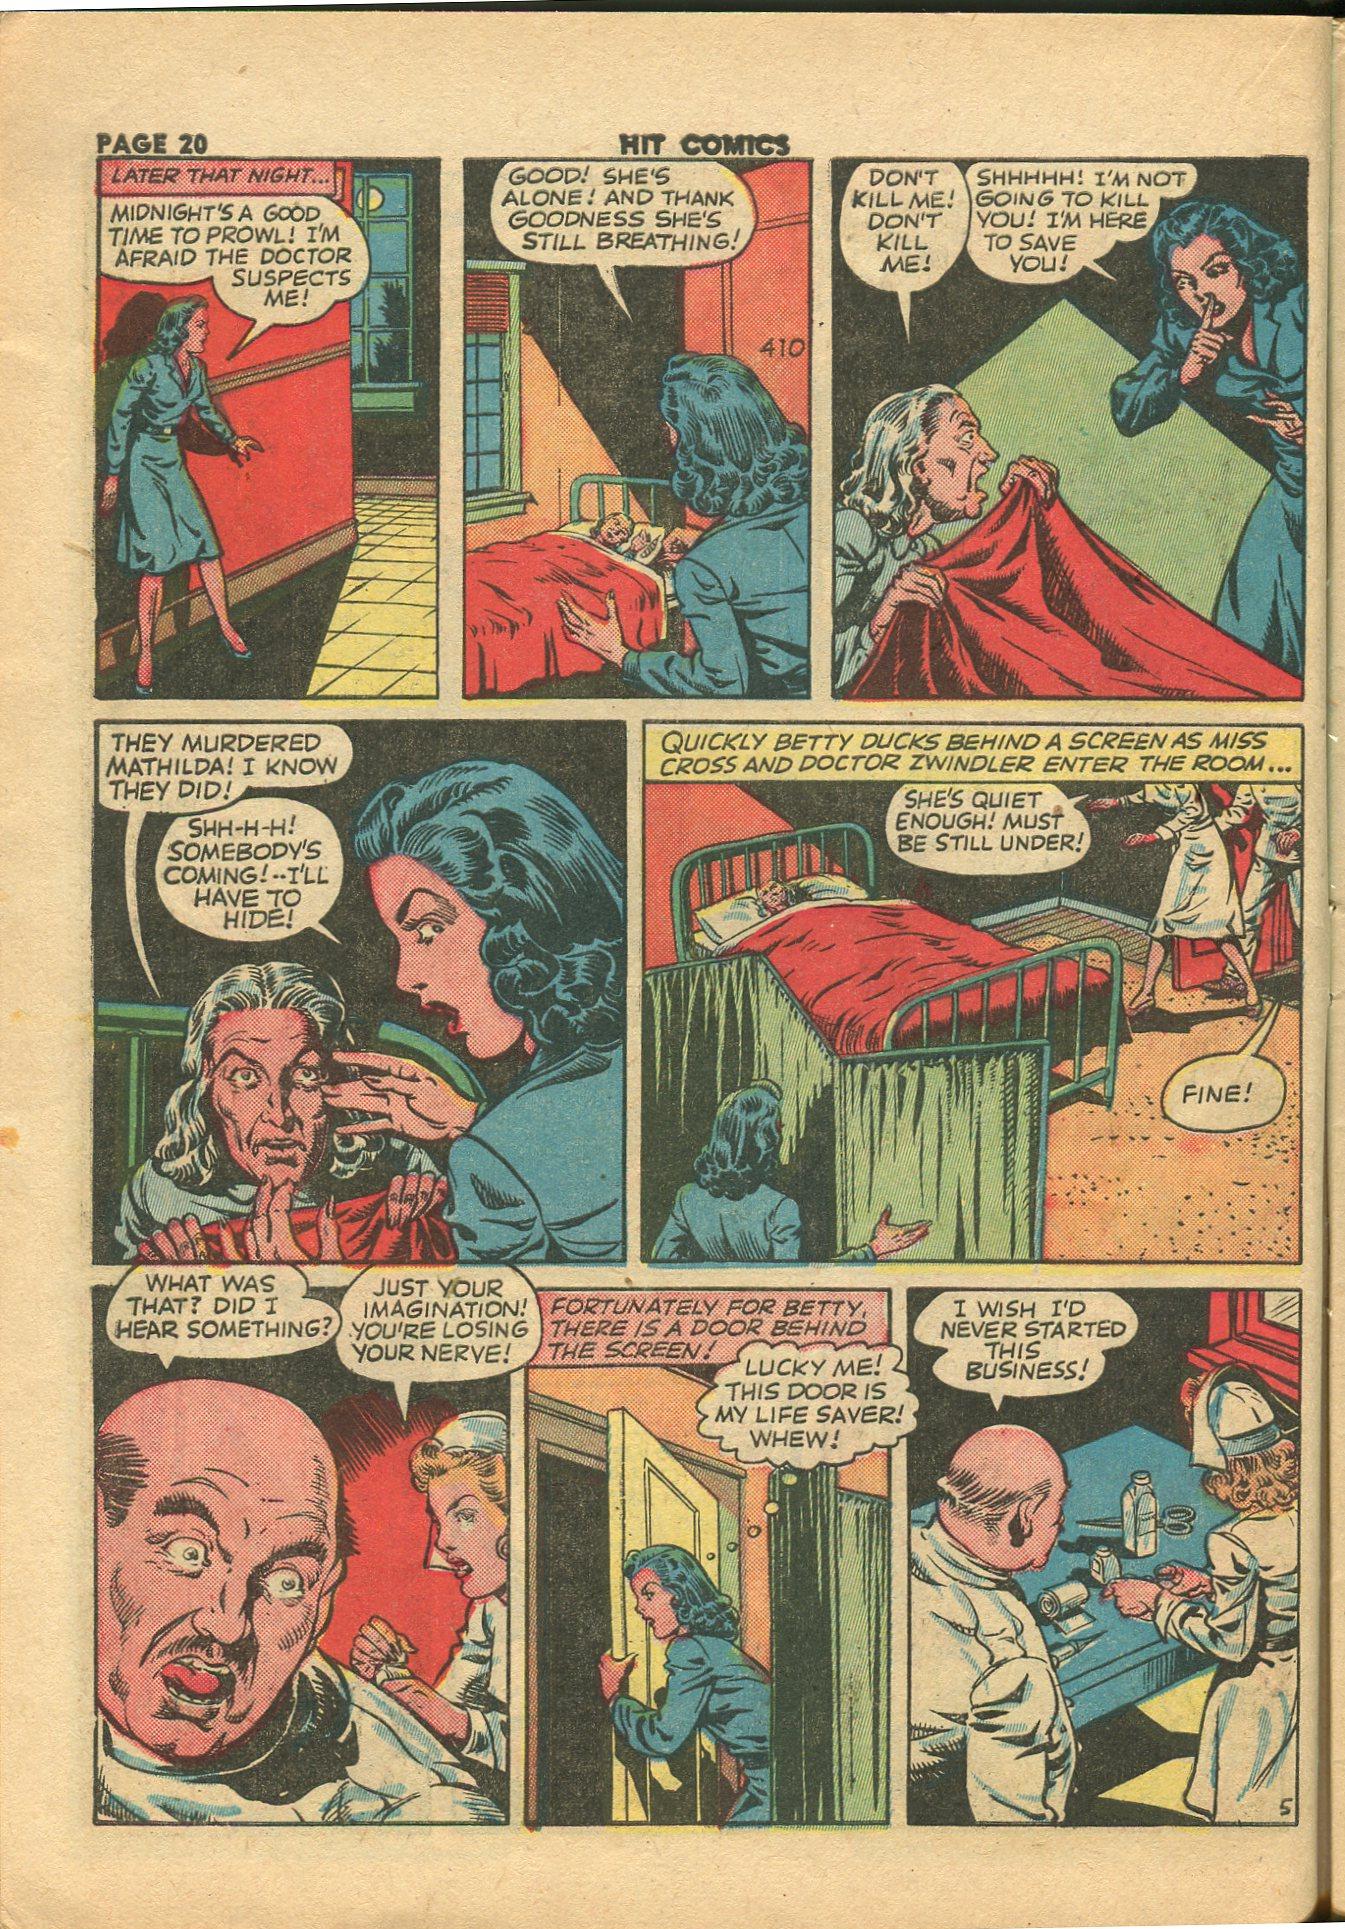 Read online Hit Comics comic -  Issue #28 - 23